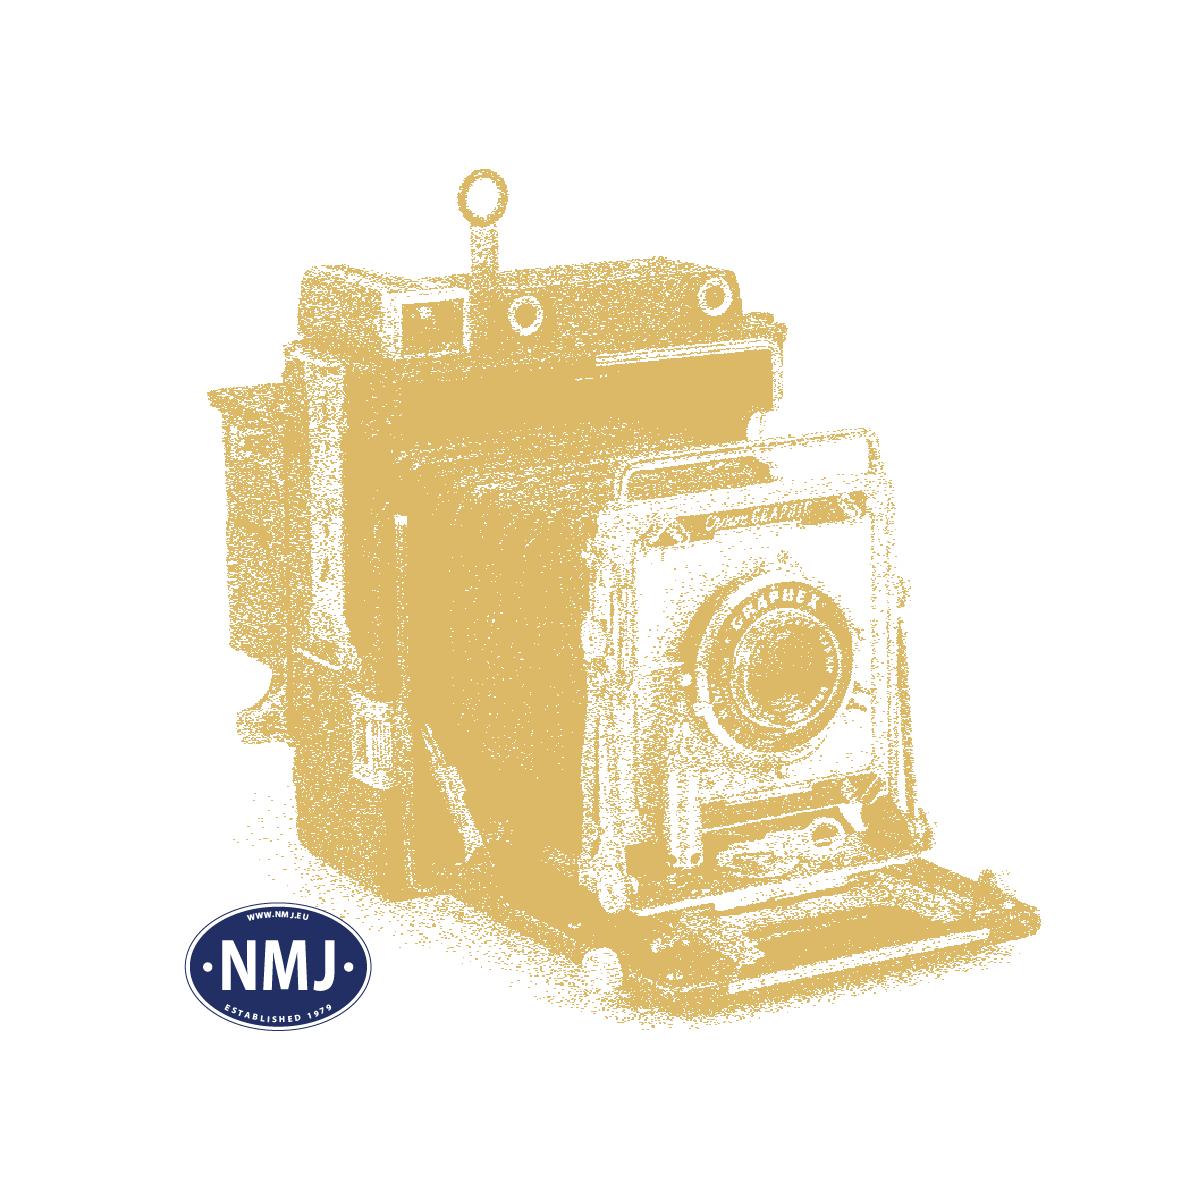 Digital, nmj-topline-94110-nsb-el14-2176-big-snow-plow-dcc-with-sound, ESU58419